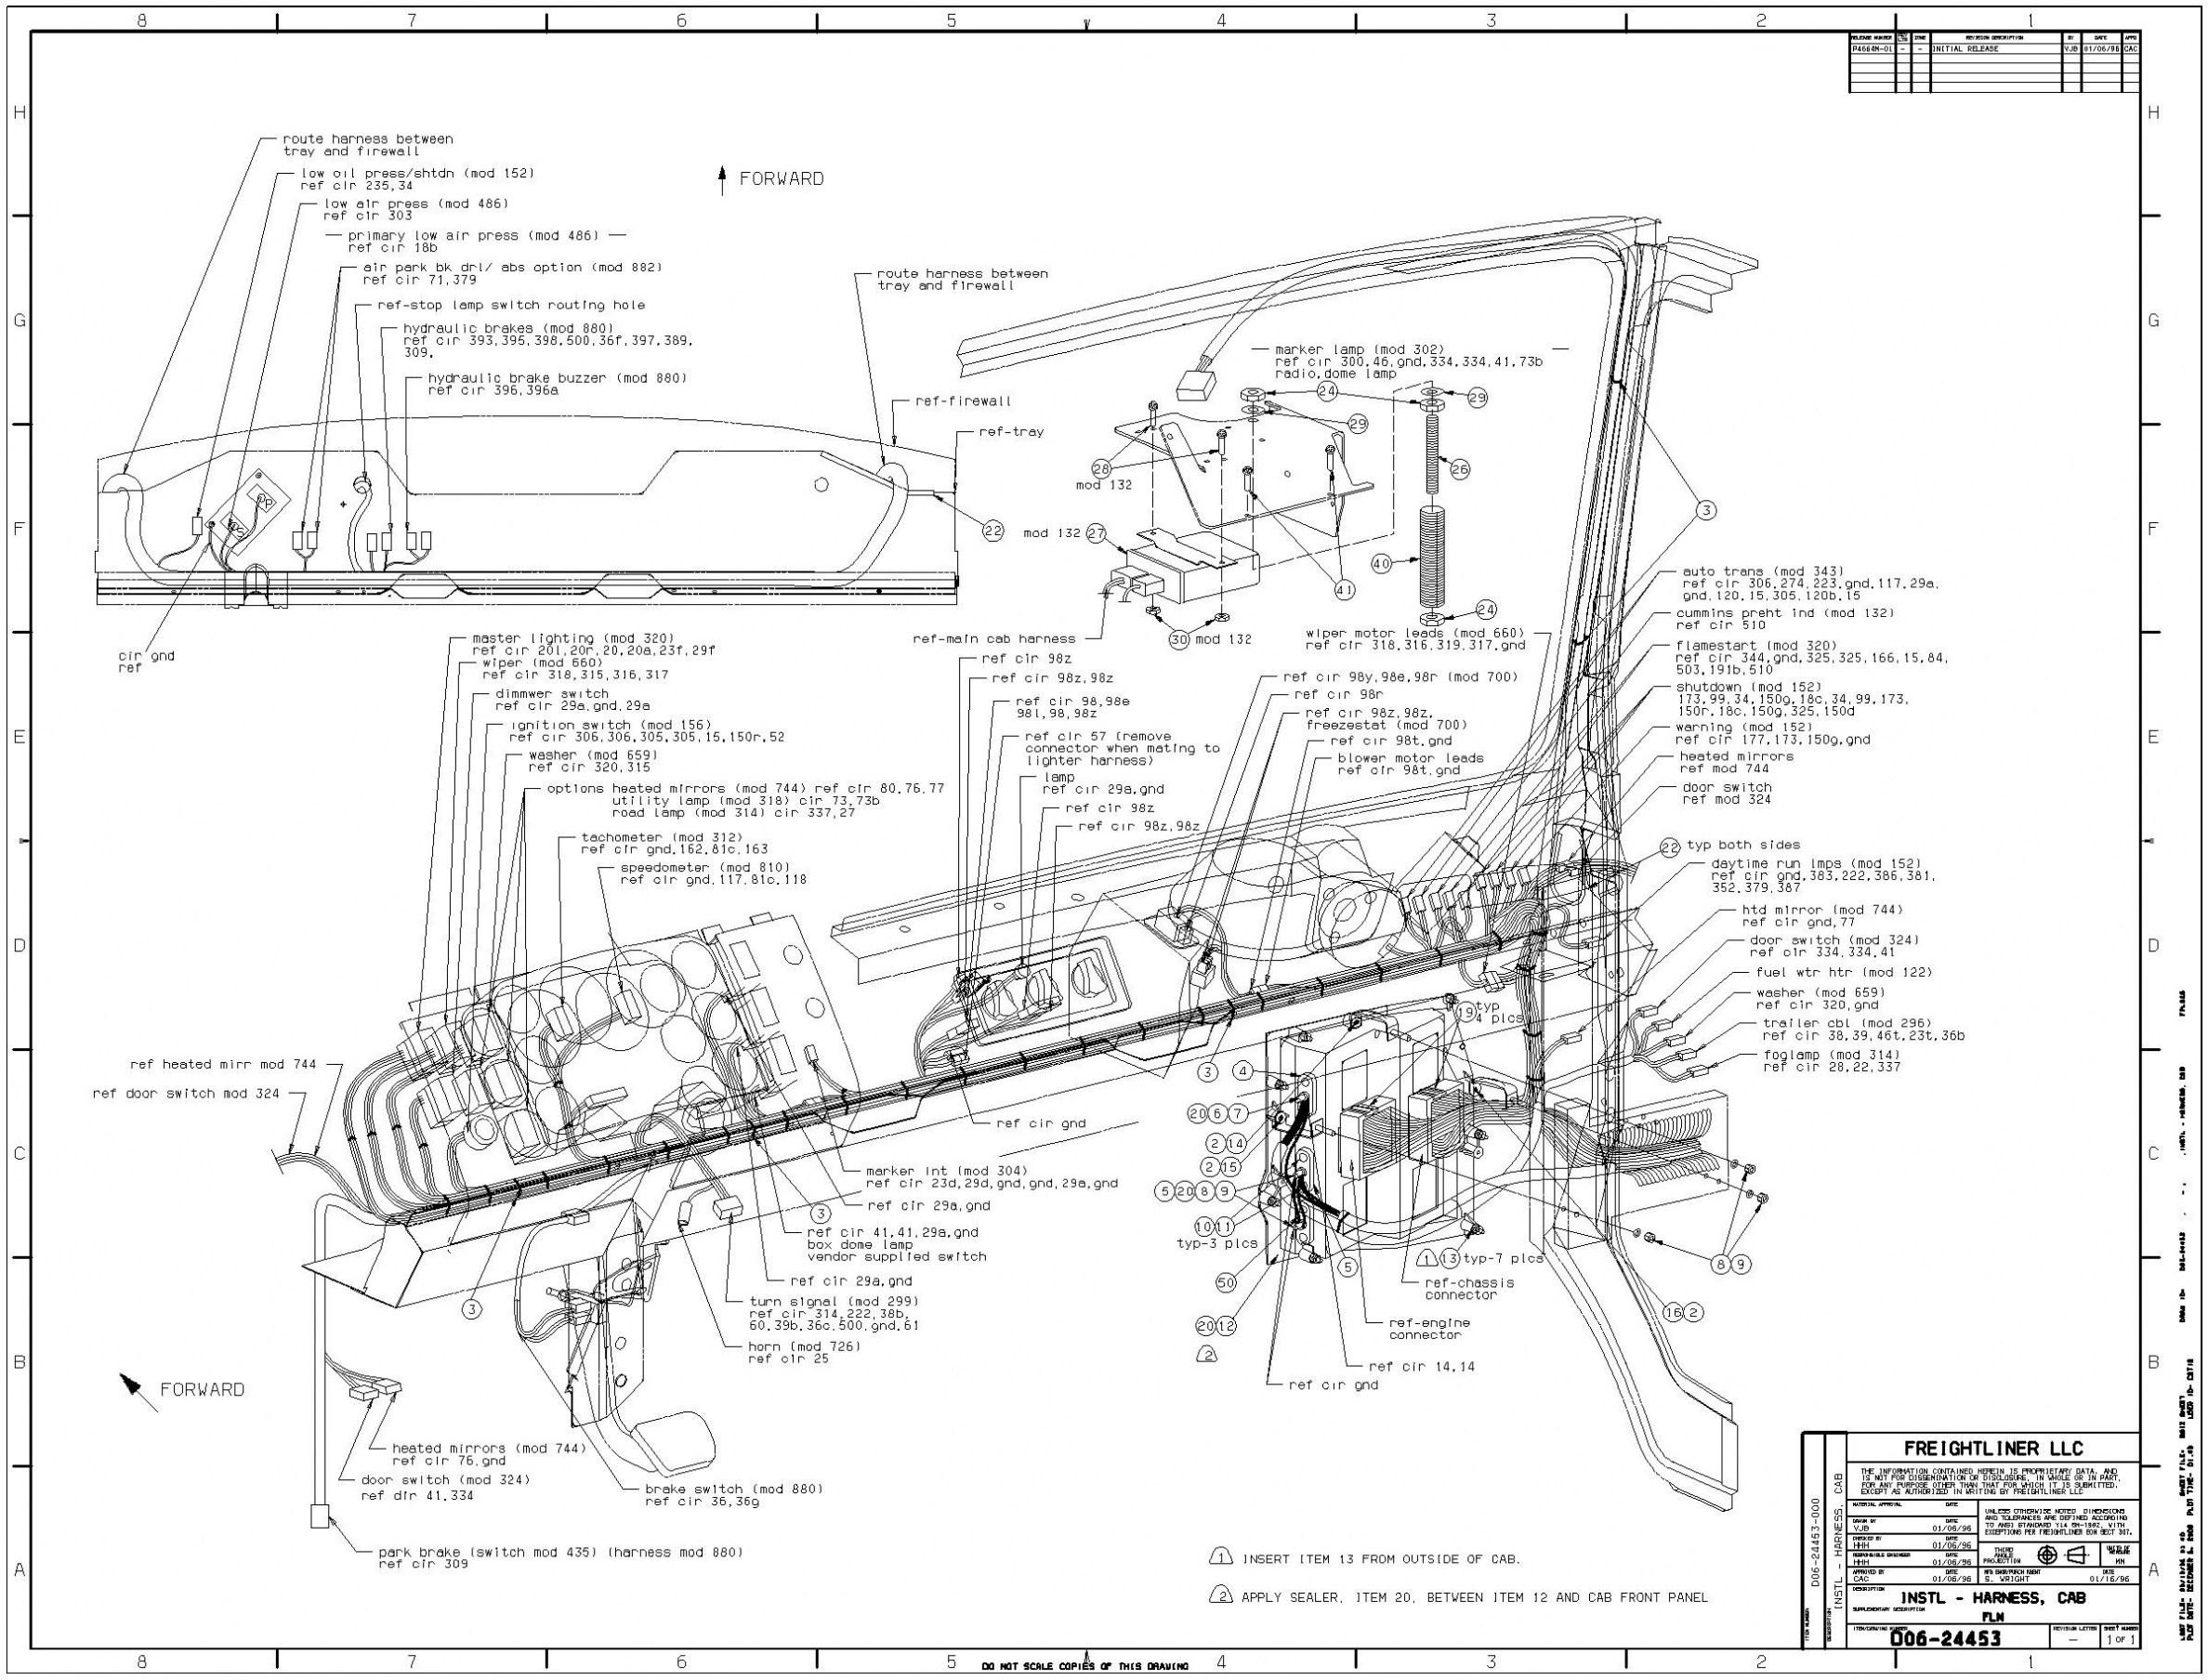 Peterbilt 320 Fuse Box Diagram - Wiring Diagram Detailed - Freightliner Headlight Wiring Diagram